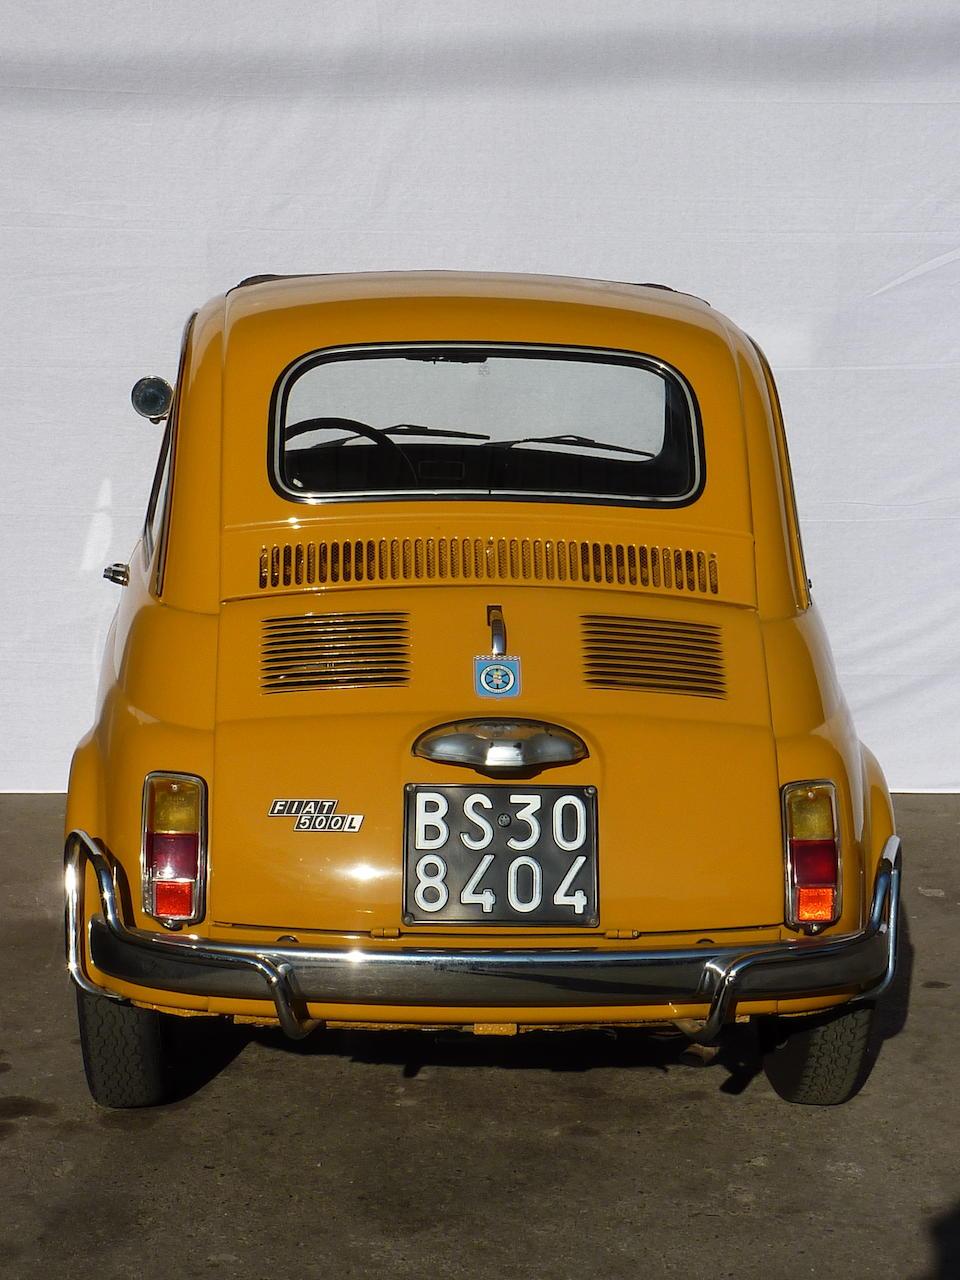 1970 Fiat 500L Saloon  Chassis no. 110 F 2615911 Engine no. 110 F 2752067